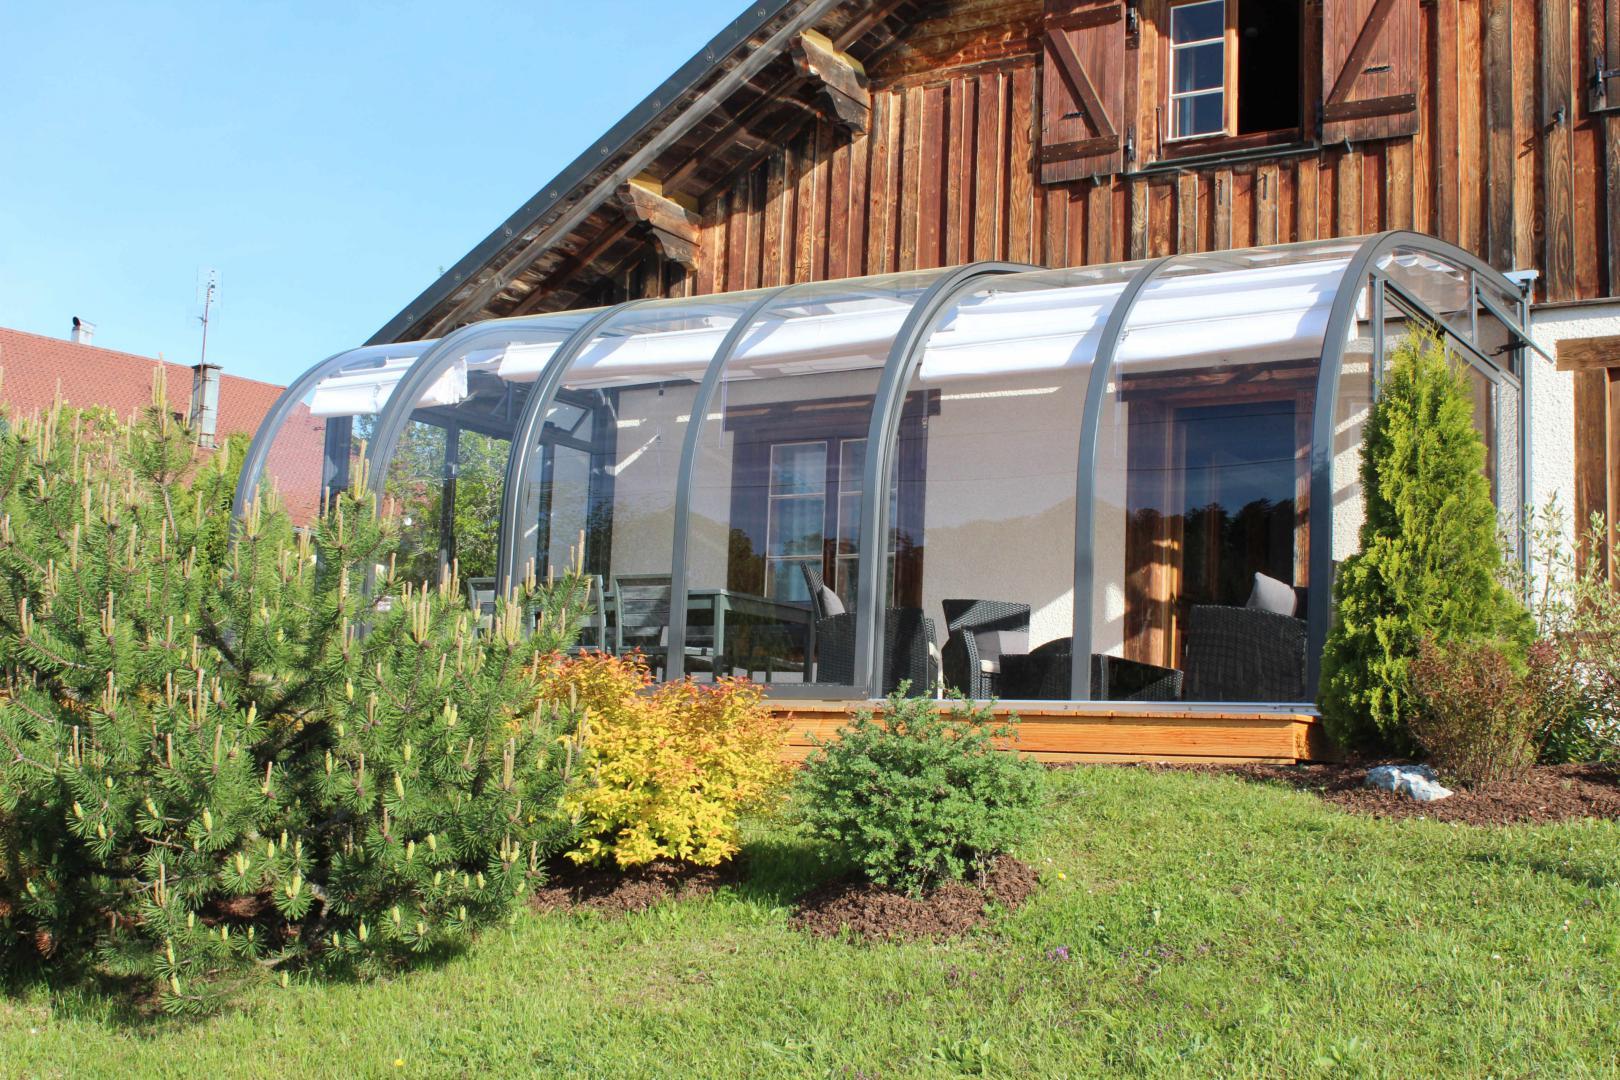 Abris de terrasse 3 saisons de type solar v randa mobile - Veranda arrondie ...